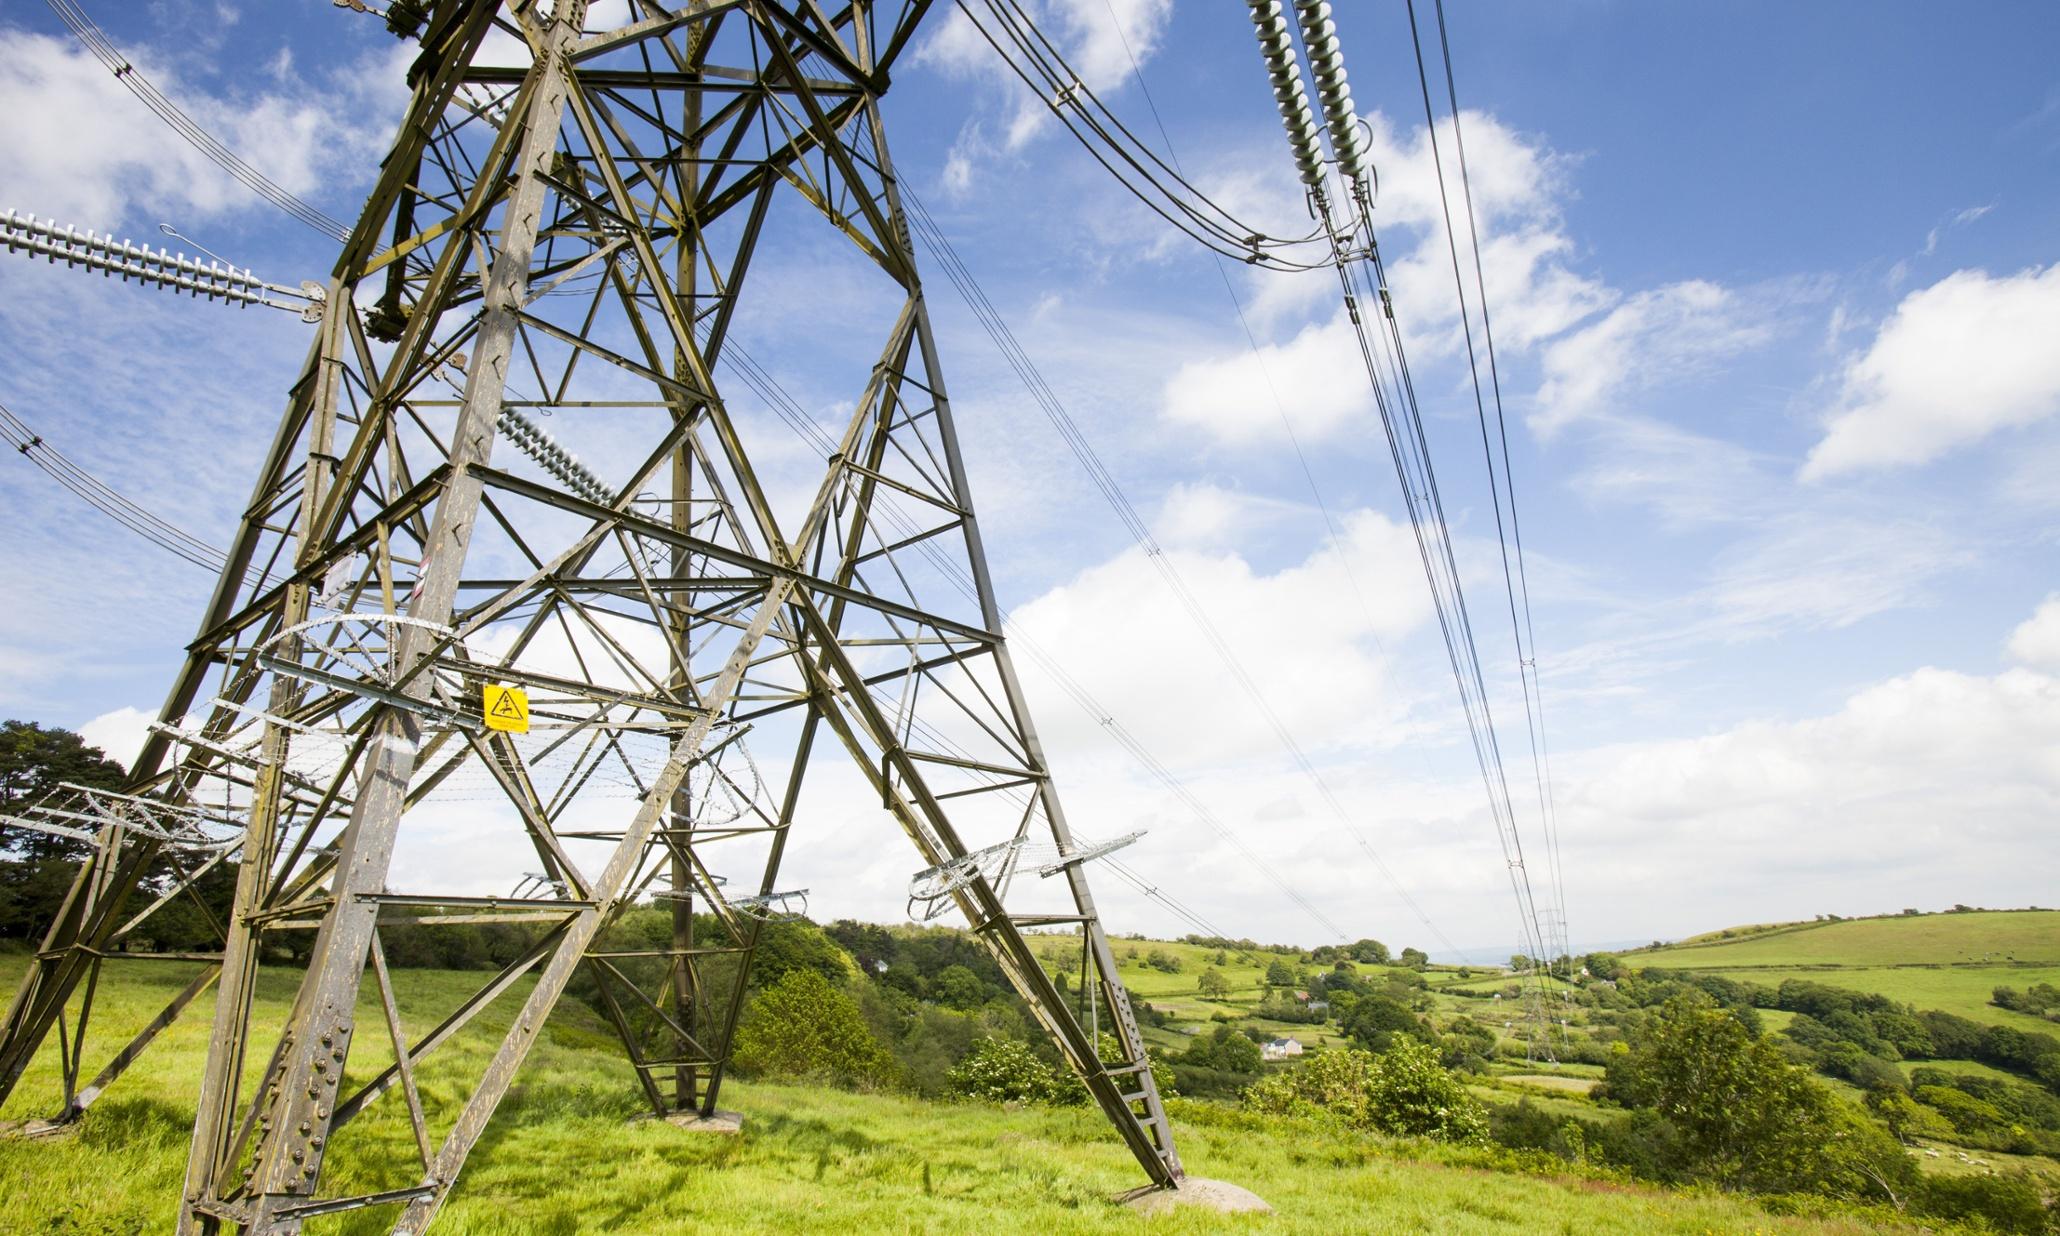 UK electricity grid holds back renewable energy, solar trade body warns